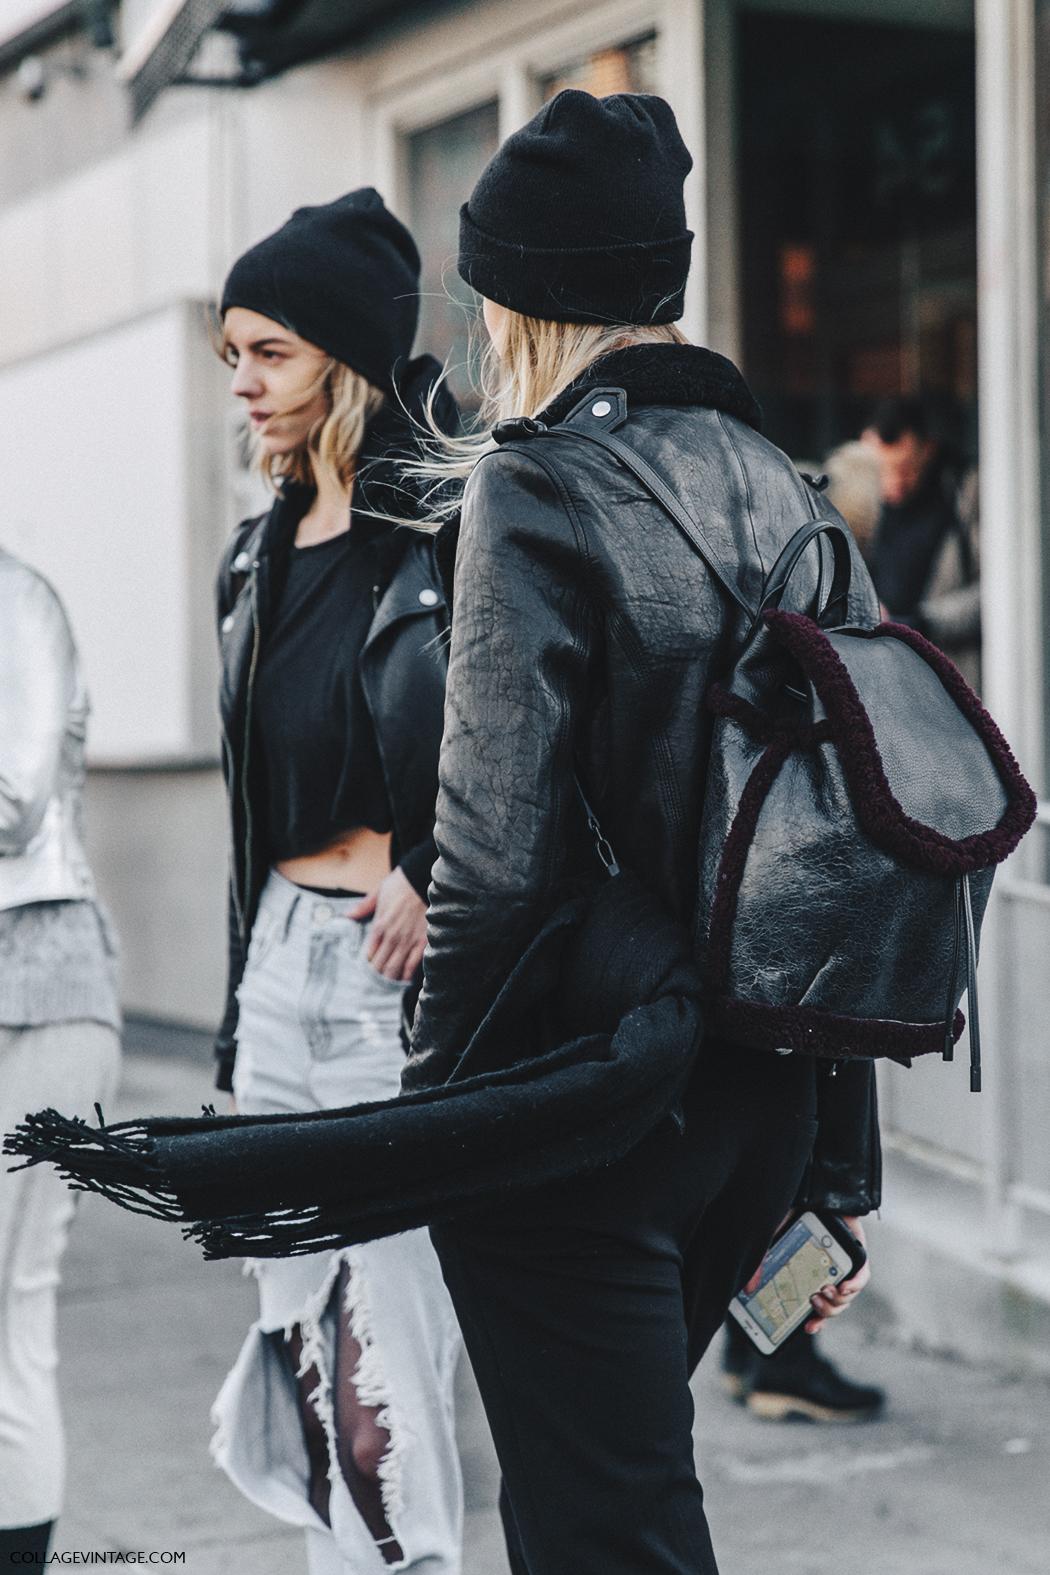 NYFW-New_York_Fashion_Week-Fall_Winter-17-Street_Style-Backpack-Black_Beanies-